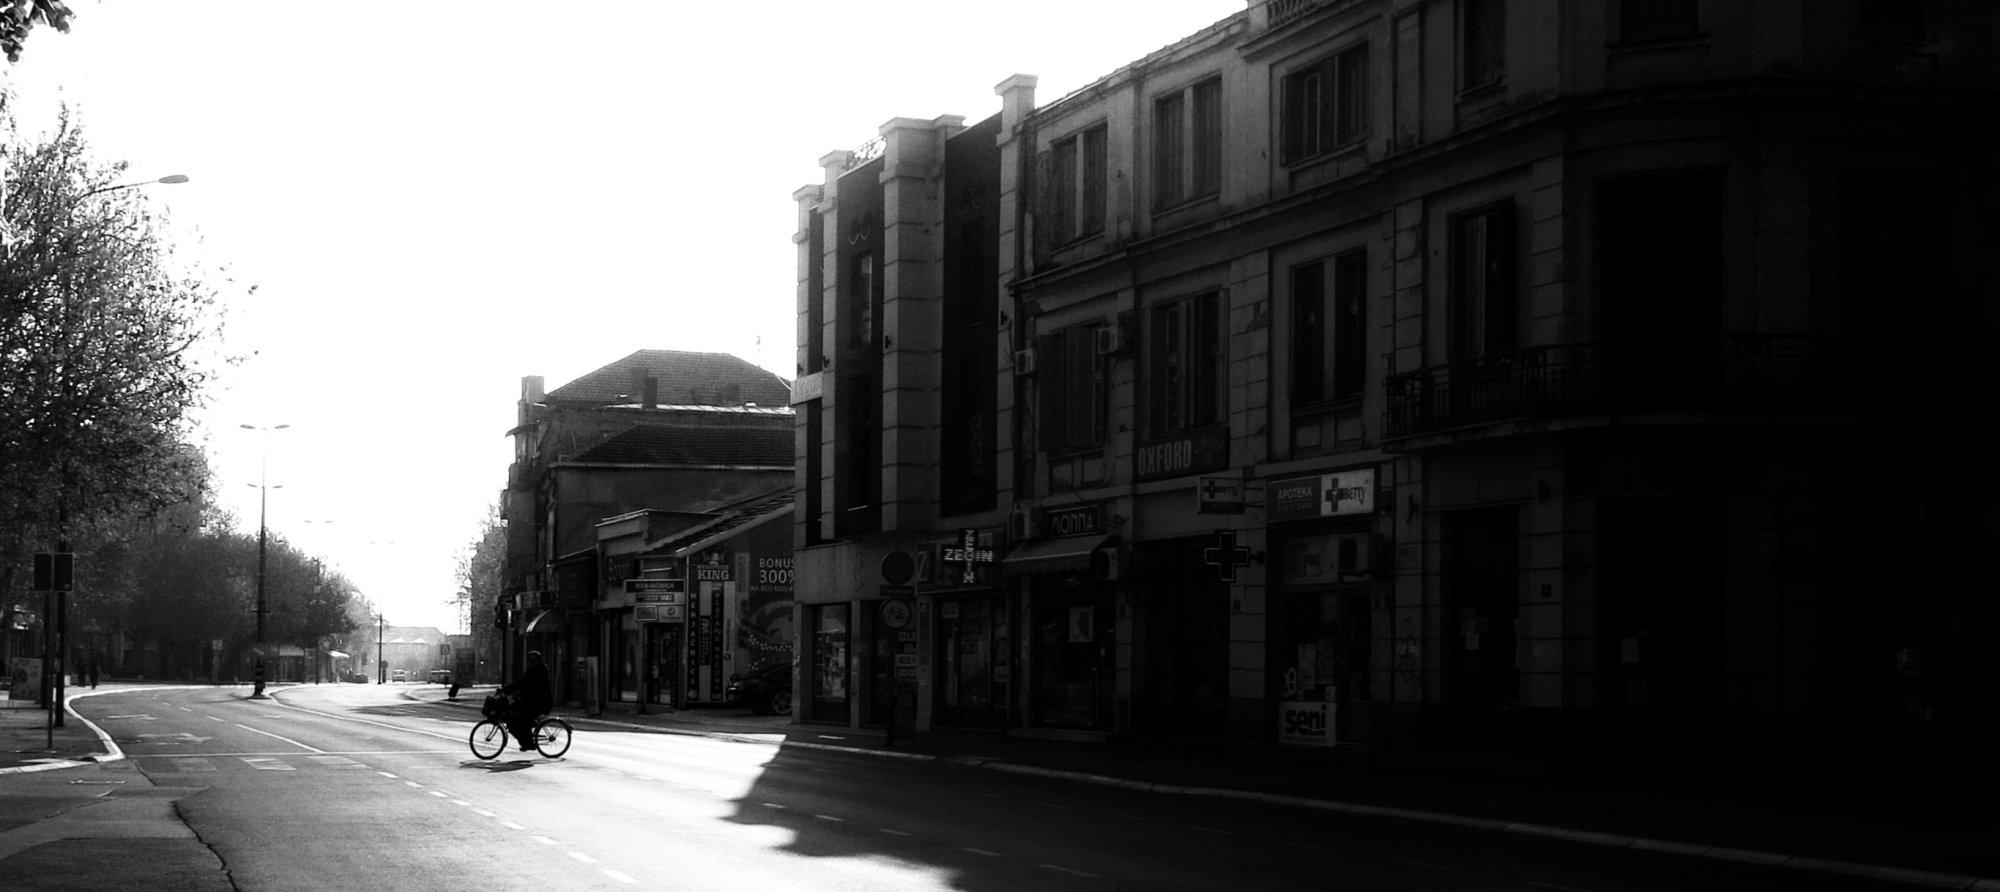 Shadows of Morning LVII